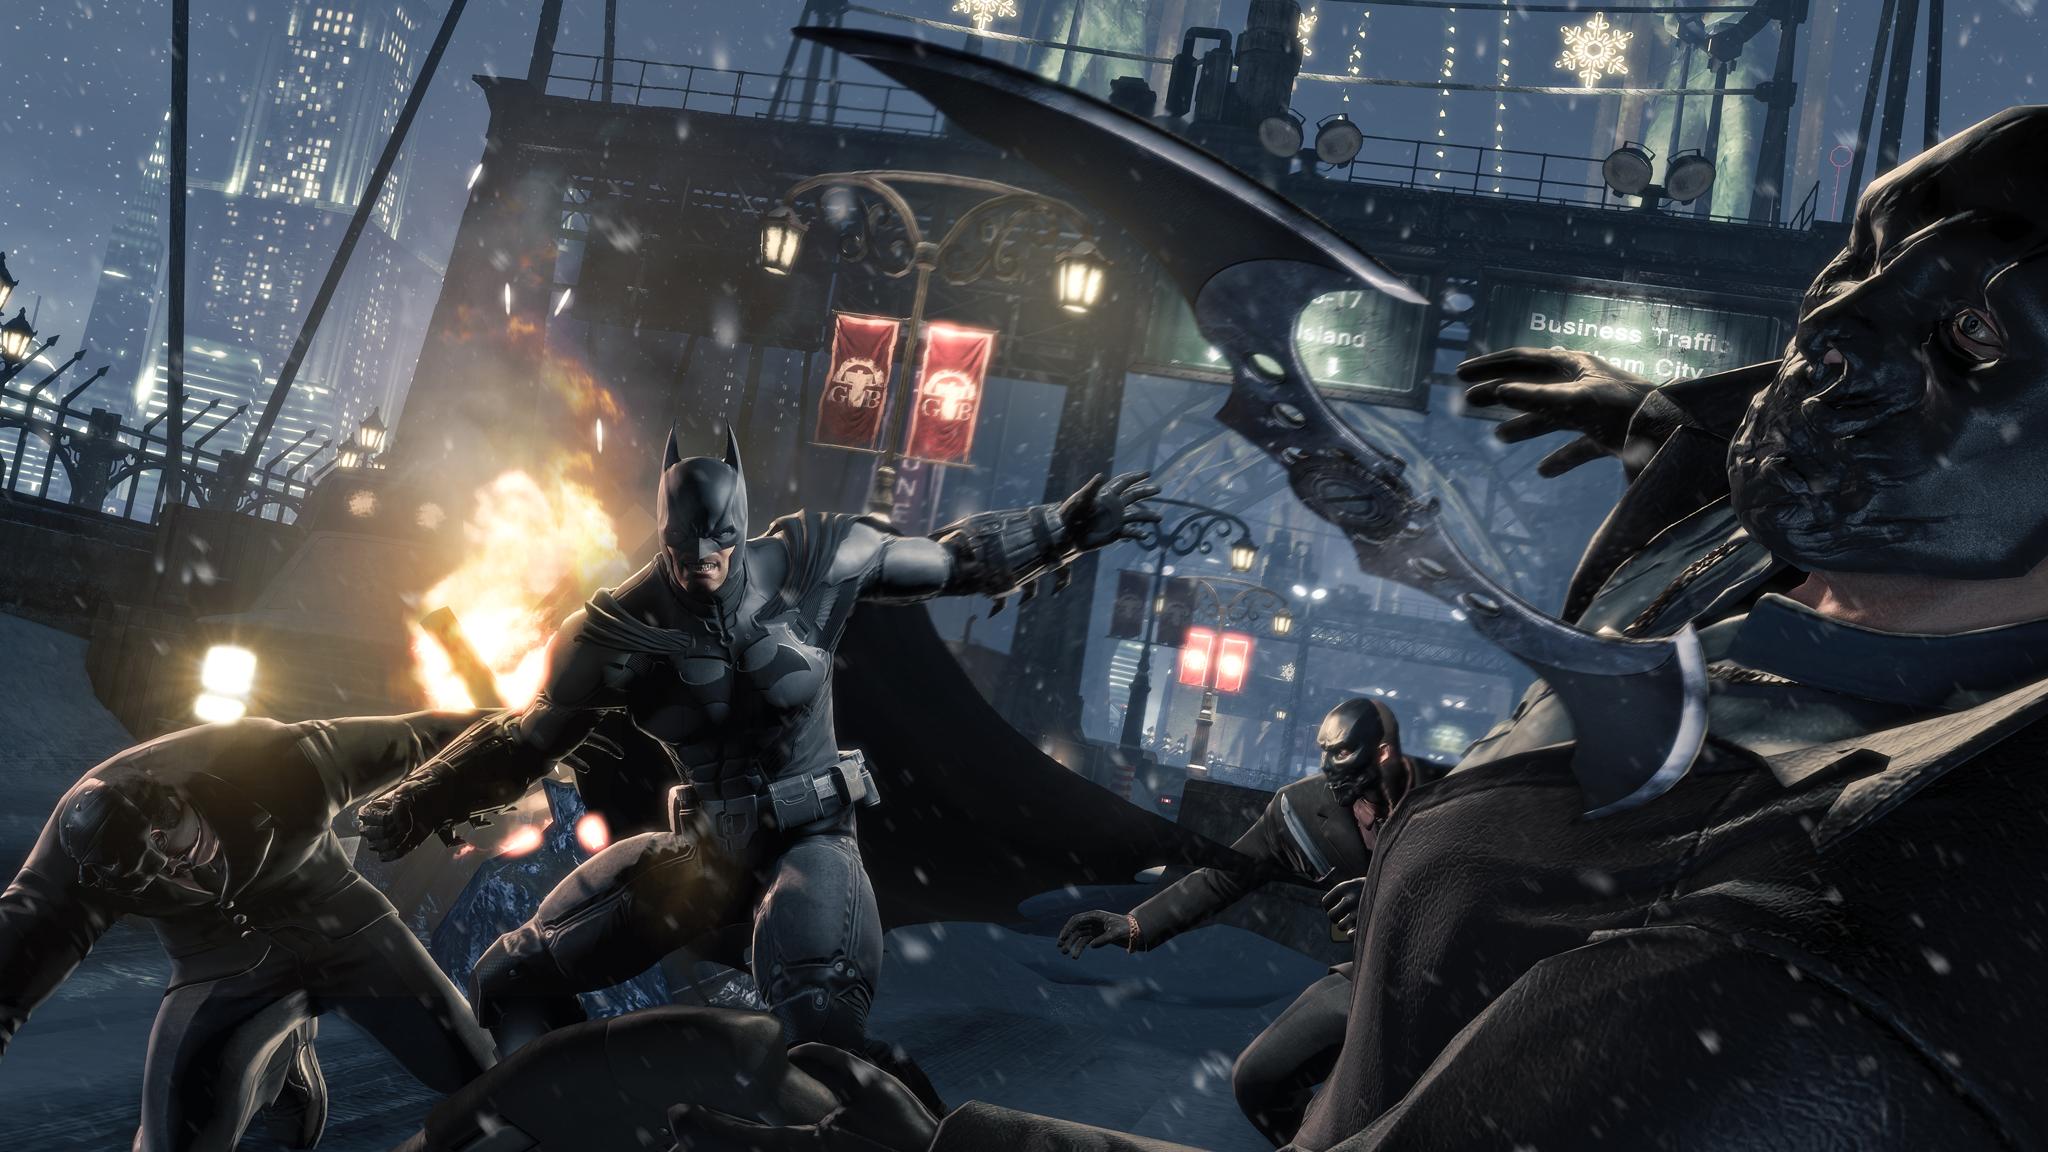 Batman: Arkham Origins: ¿dónde está tu villano favorito?